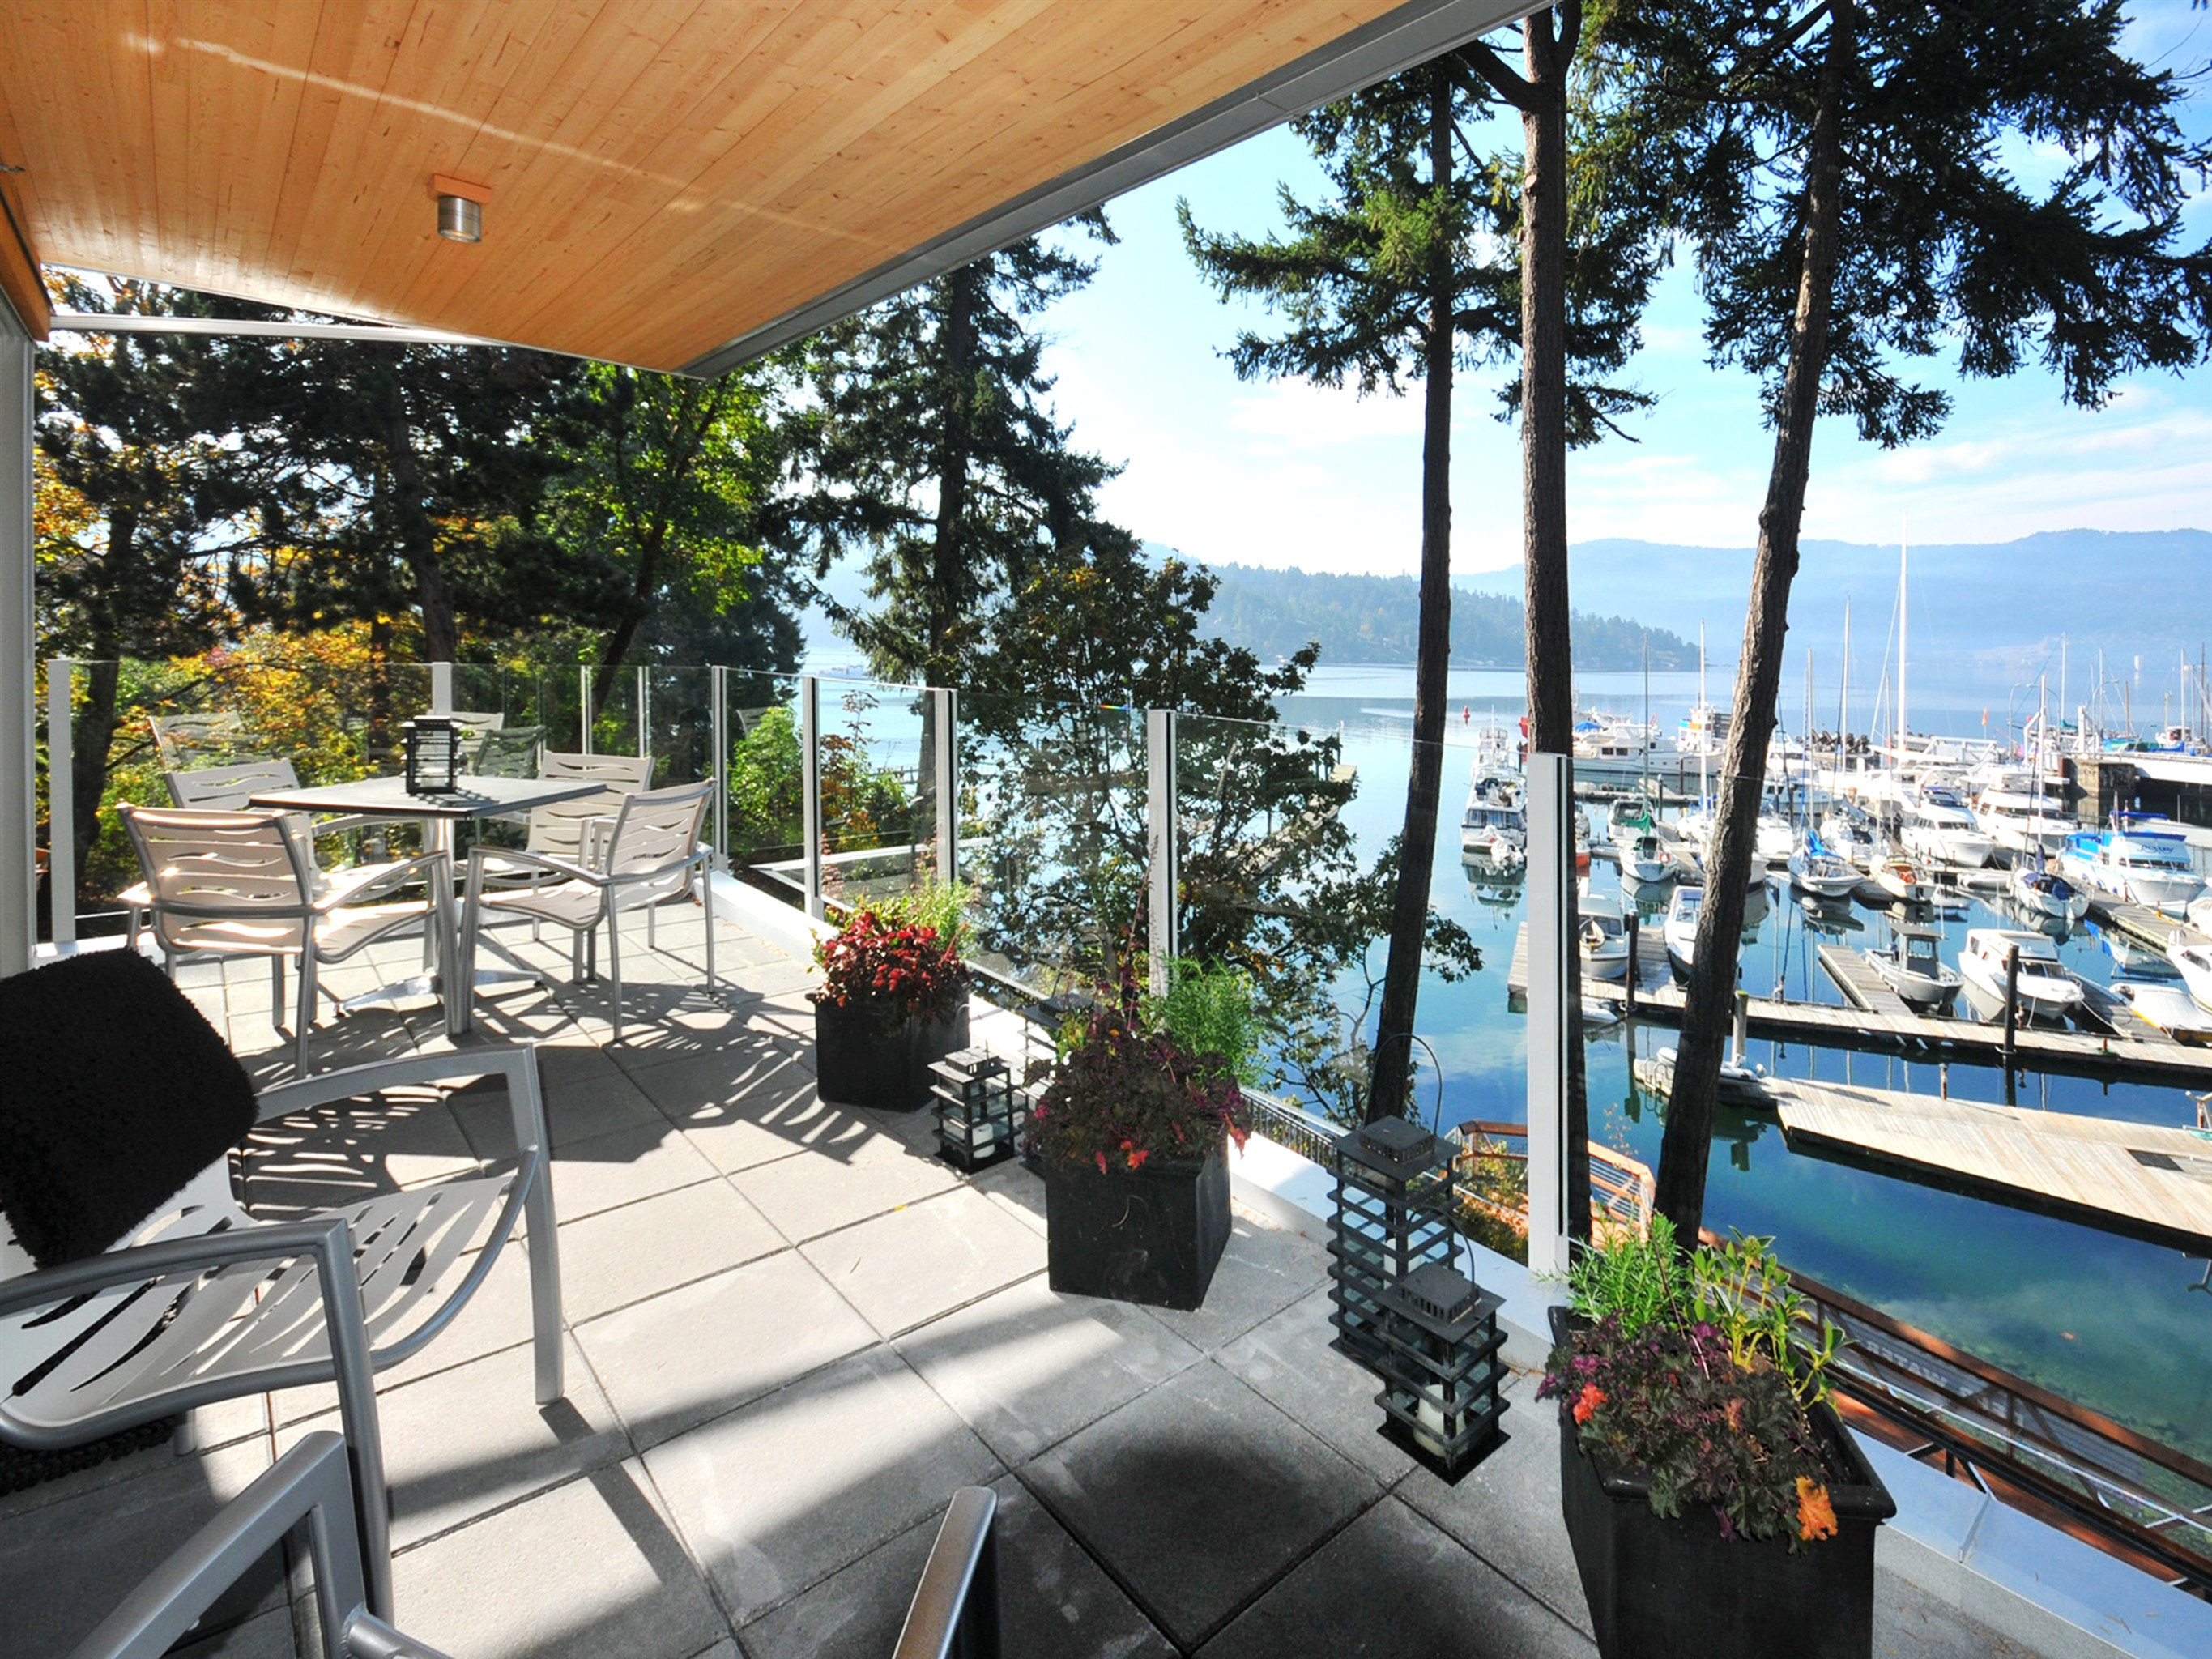 Balcony Boat Modern Outdoor Activities Outdoors Resort Romantic Terrace Waterfront tree sky property home vehicle condominium Villa porch Deck